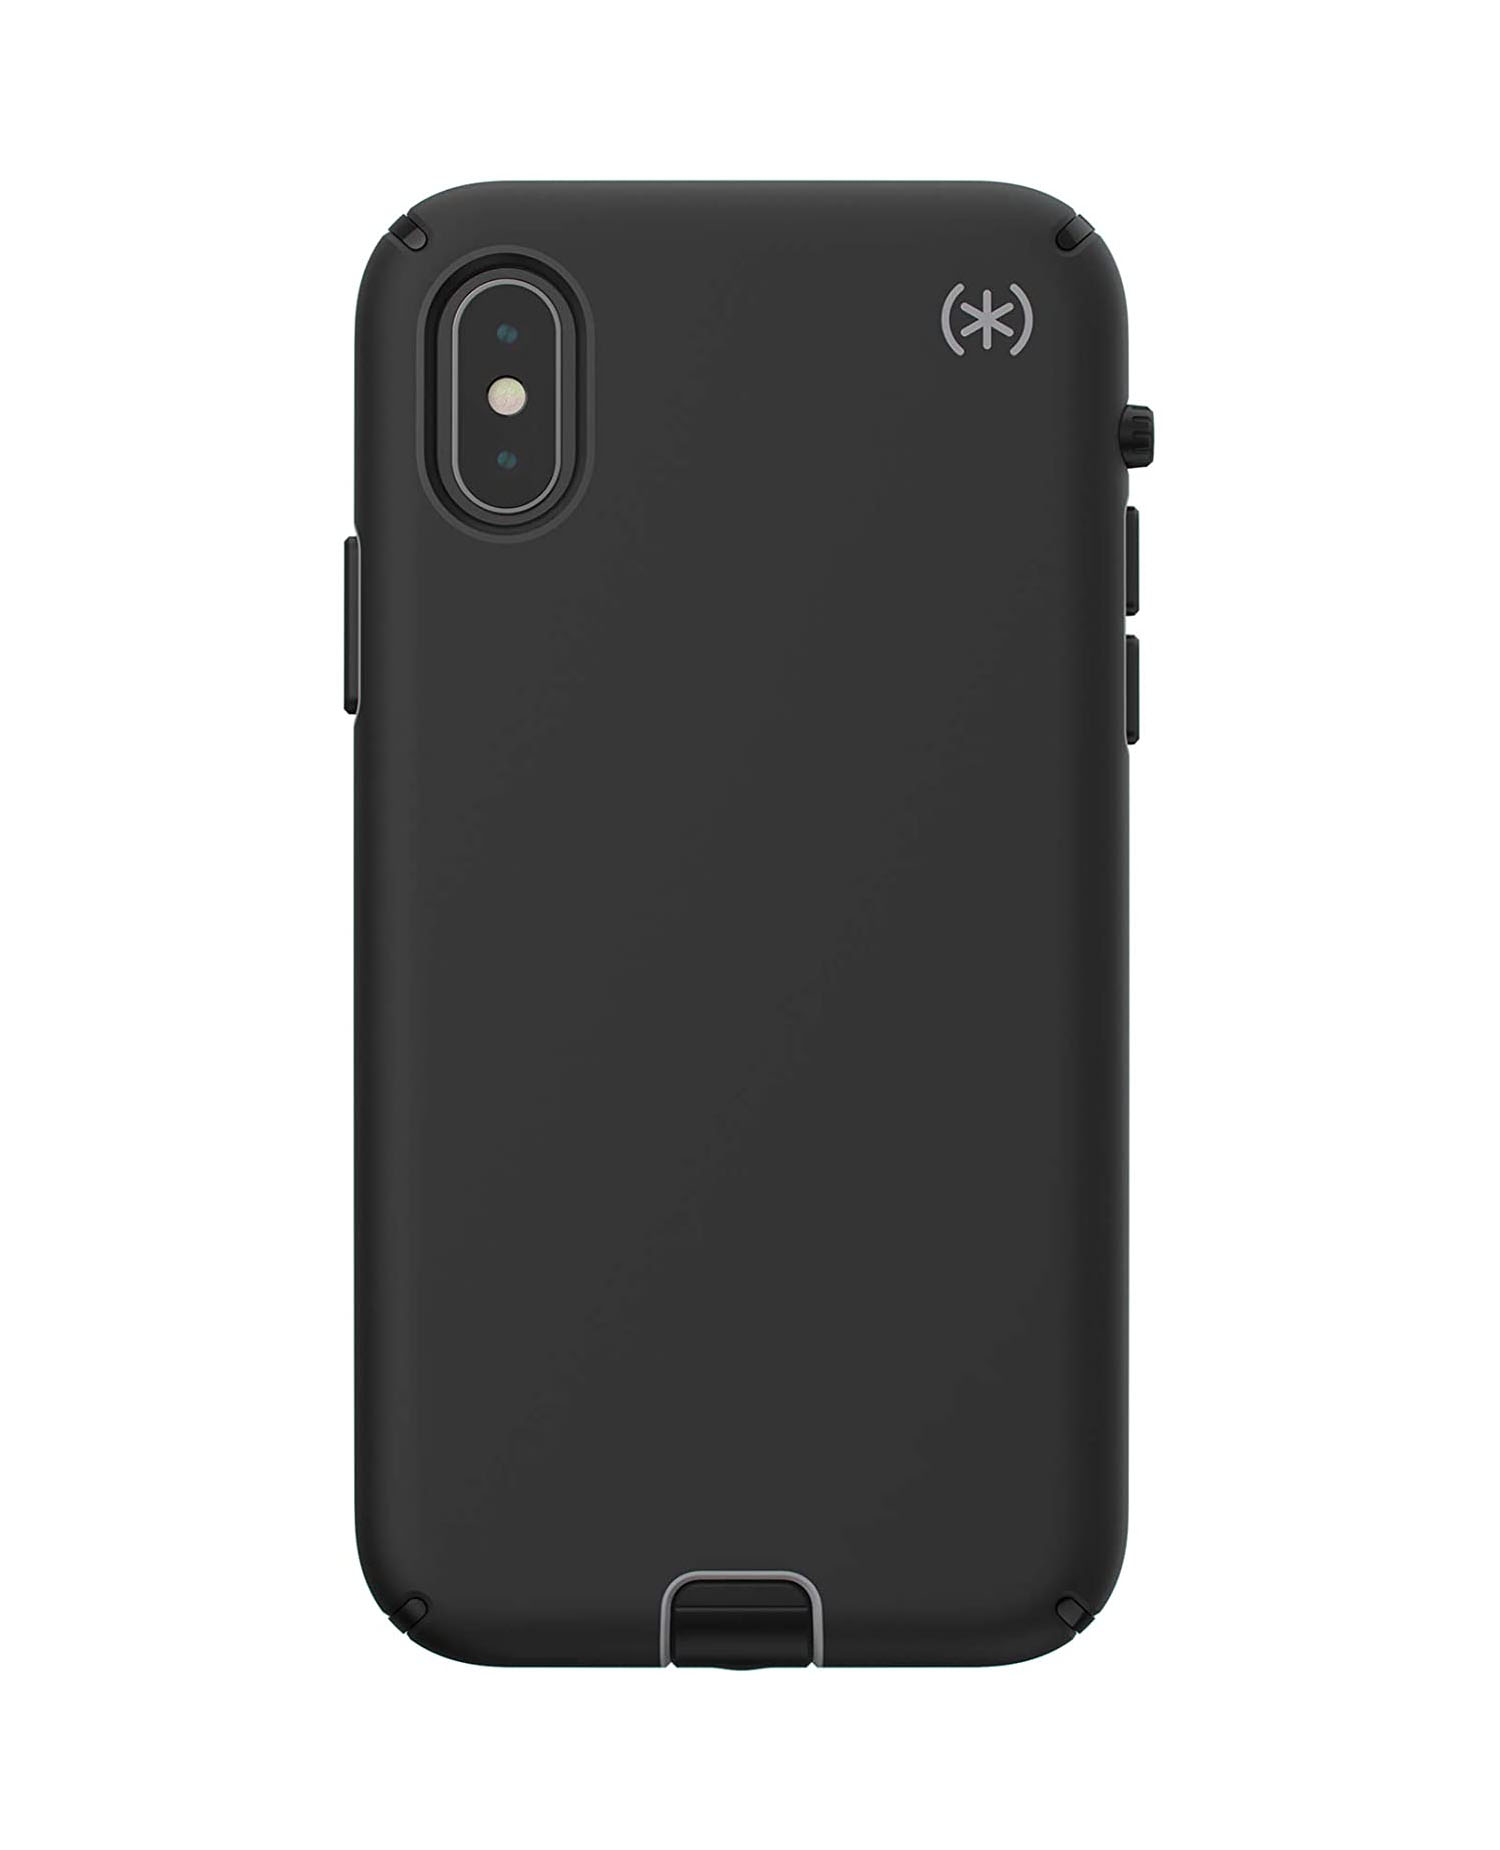 Speck Presidio Sport Case for Apple iPhone XR - Black/Gunmetal Grey/Black